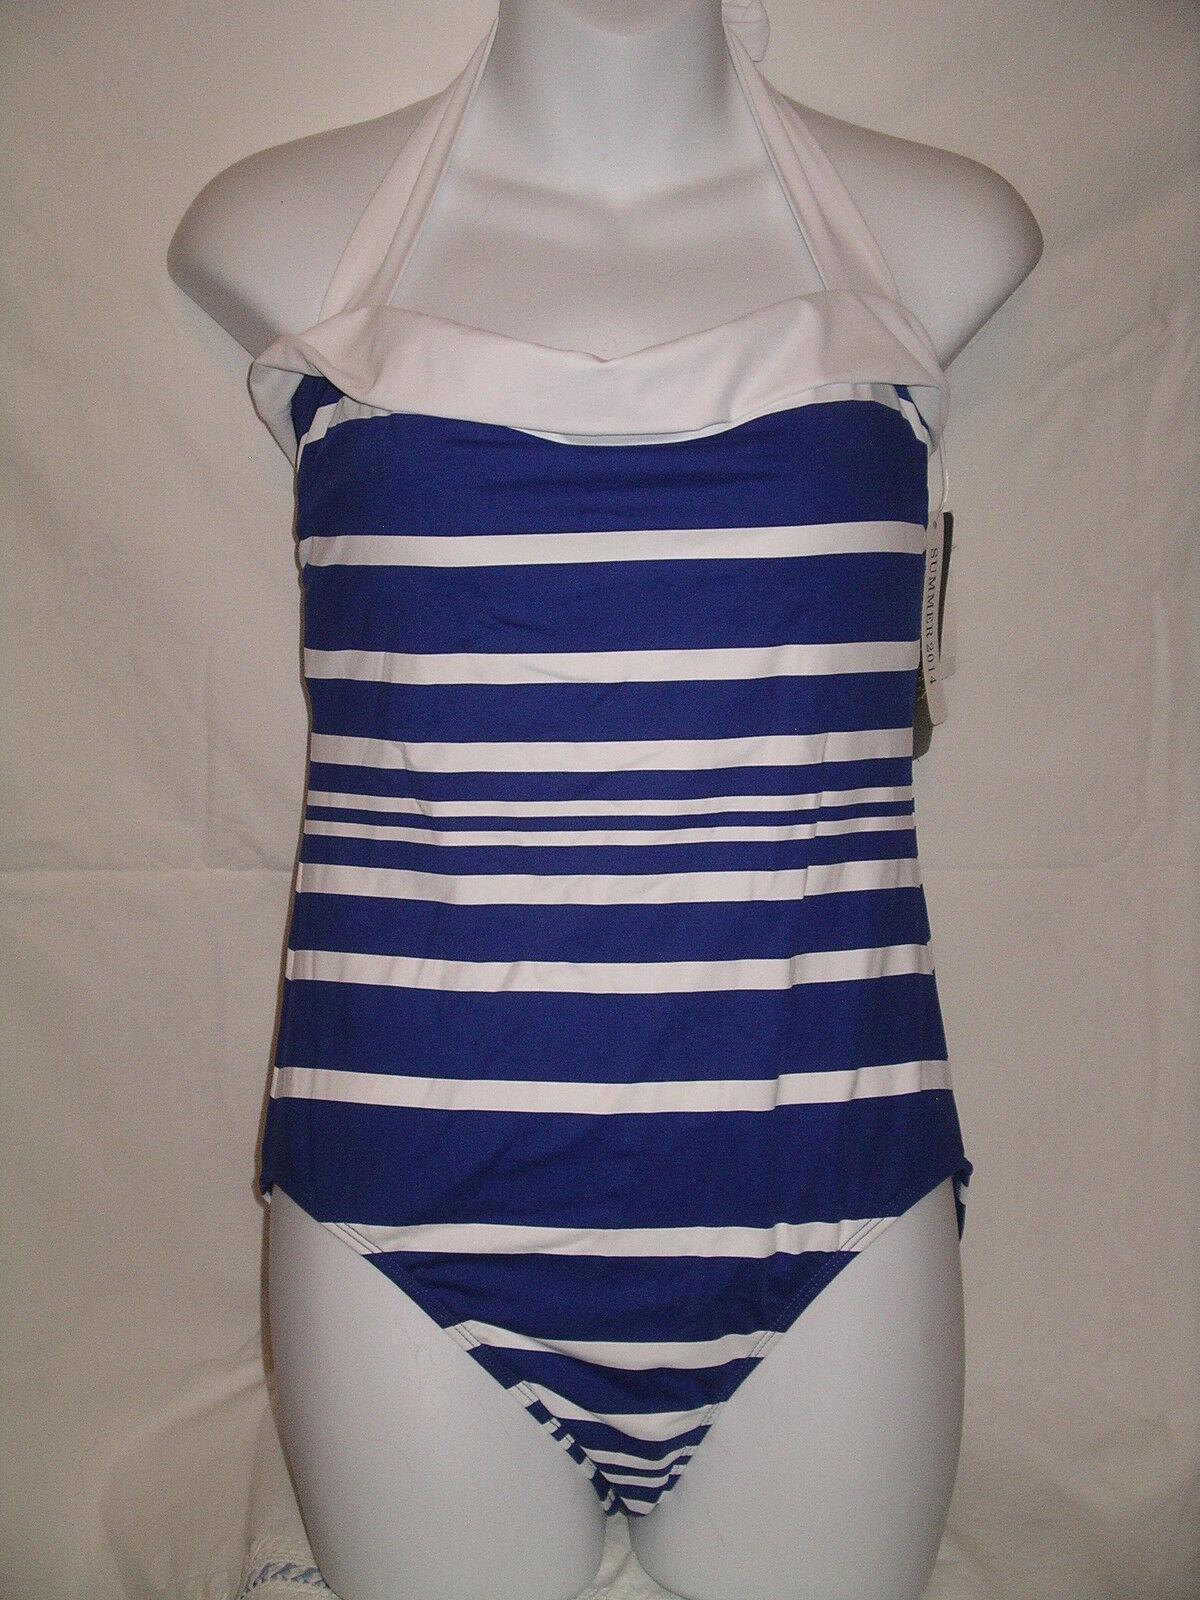 RALPH LAUREN Navy bluee & White MIO Stripe 1 Pc Tank Swimsuit - 10 - NWT  109